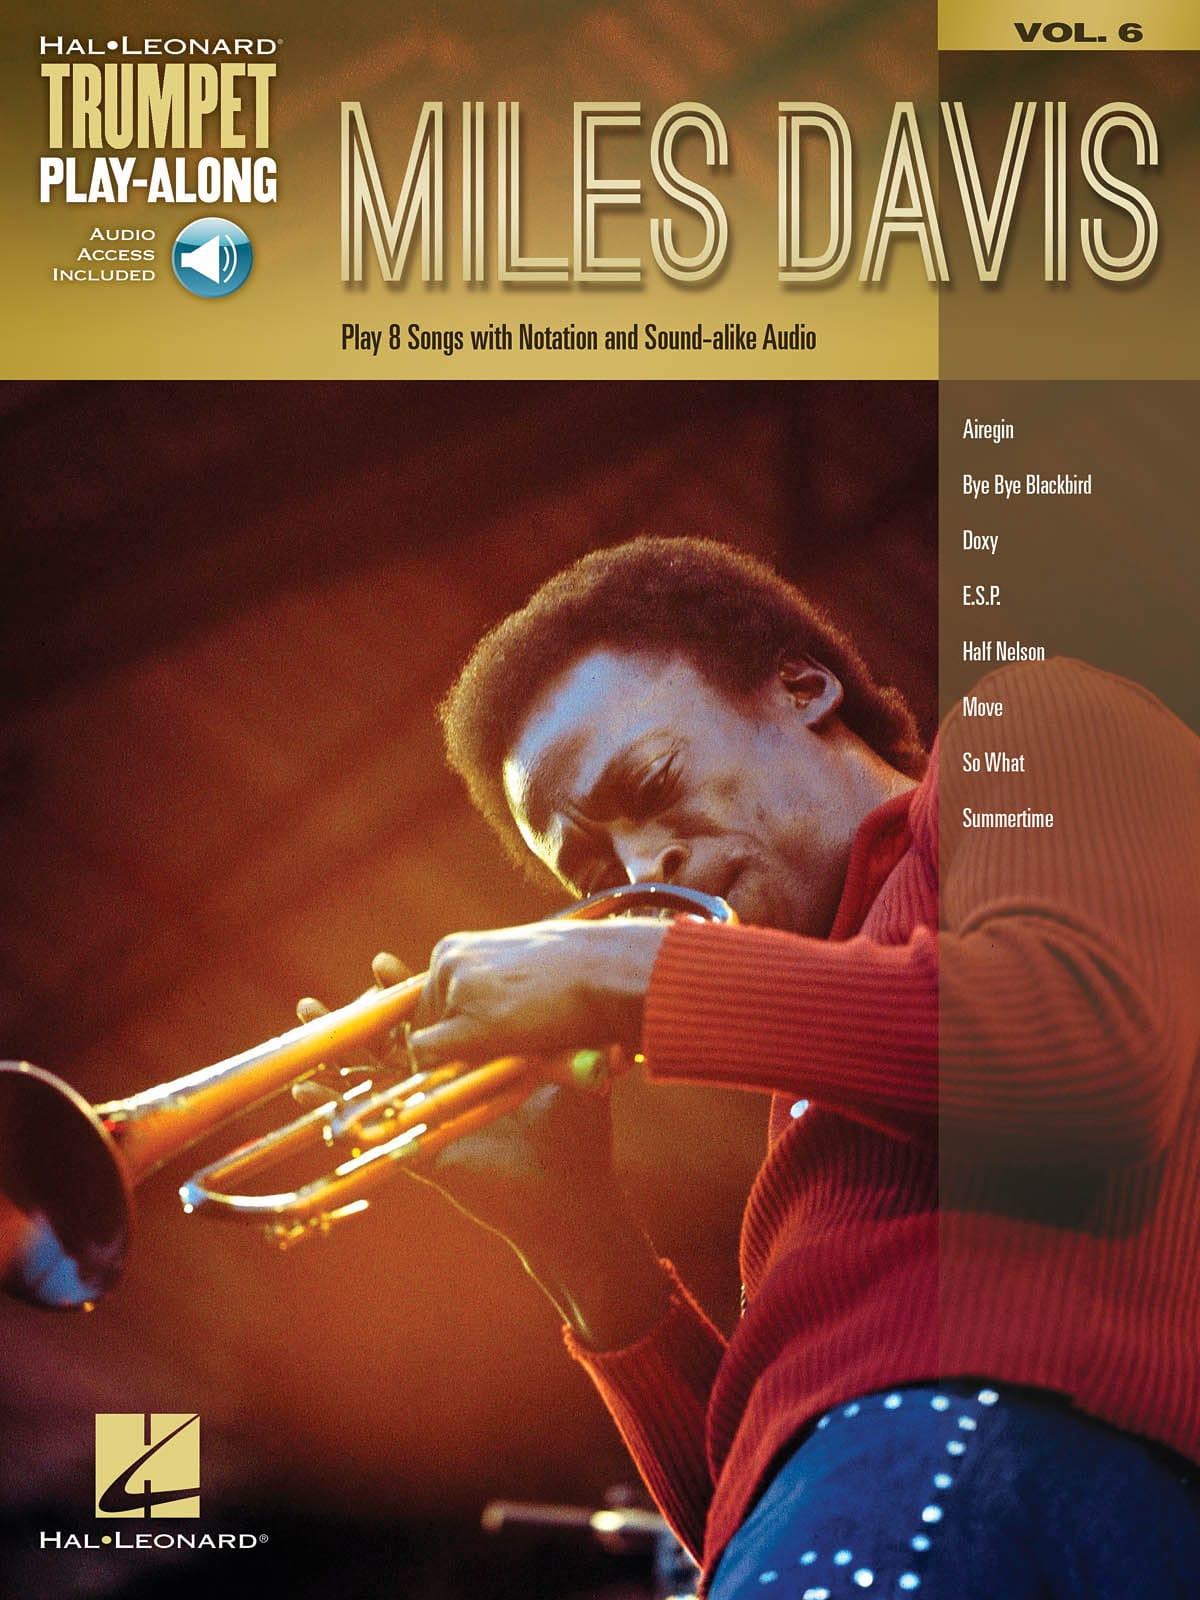 Miles Davis - Trumpet Play-Along Volume 6 Miles Davis - Partition - di-arezzo.co.uk